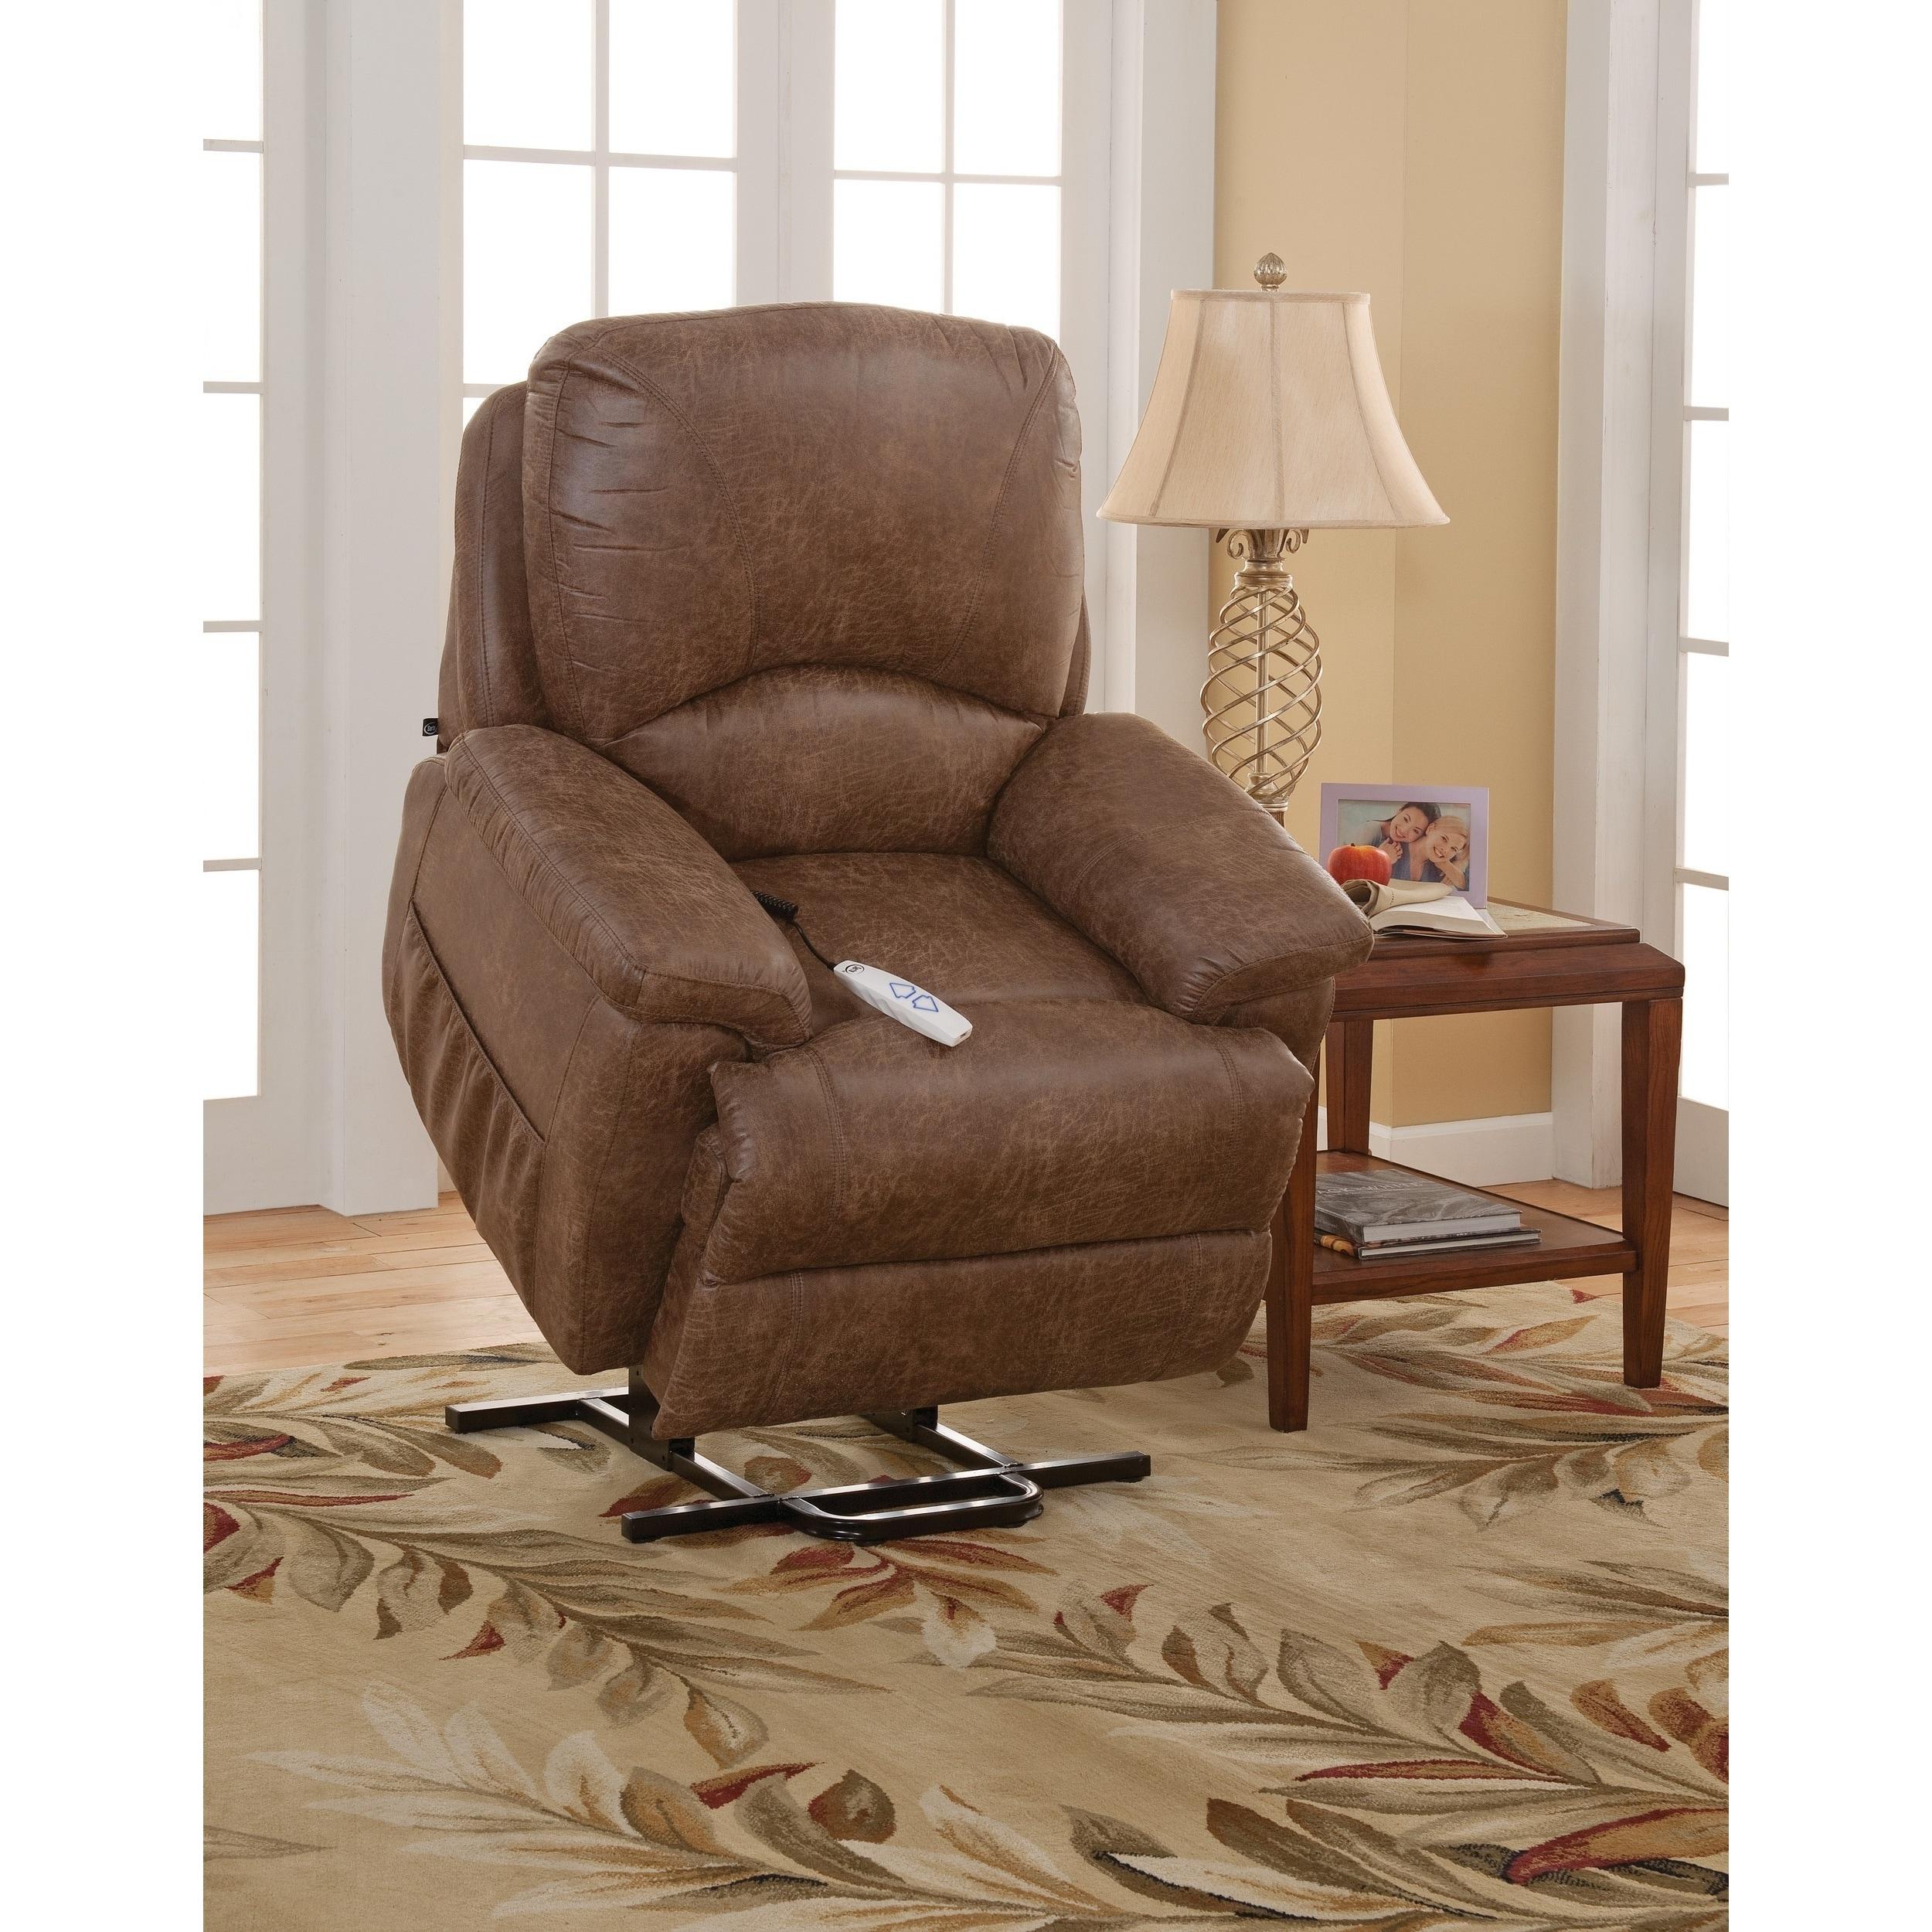 dual com loveseat amazon dp curbside chair recliner serta personal delivery hampton comfort care walnut lift health